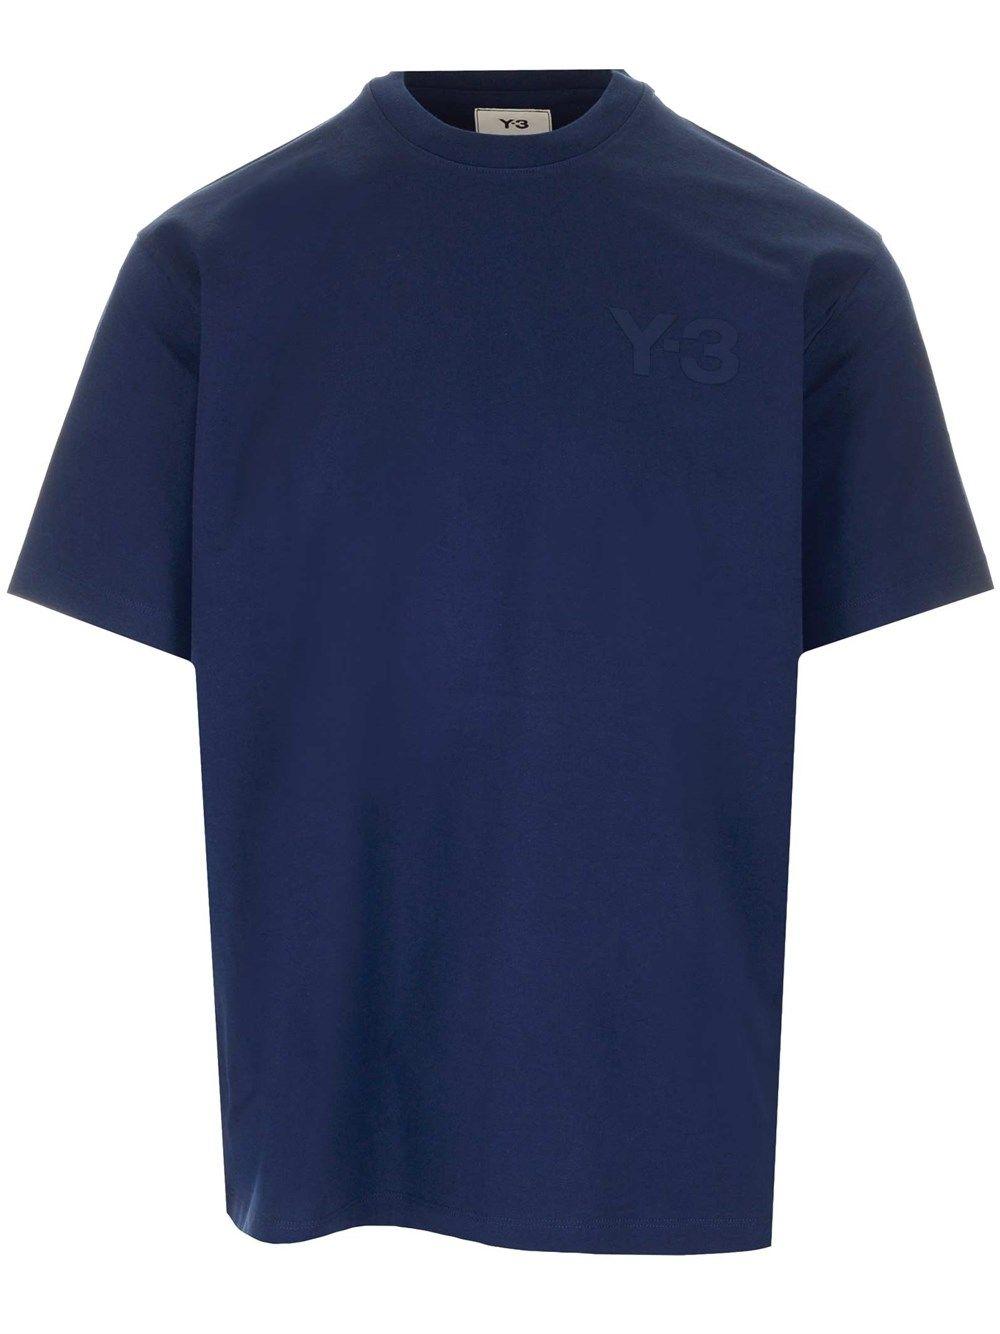 Adidas Y-3 Yohji Yamamoto Cottons ADIDAS Y-3 YOHJI YAMAMOTO MEN'S BLUE OTHER MATERIALS T-SHIRT